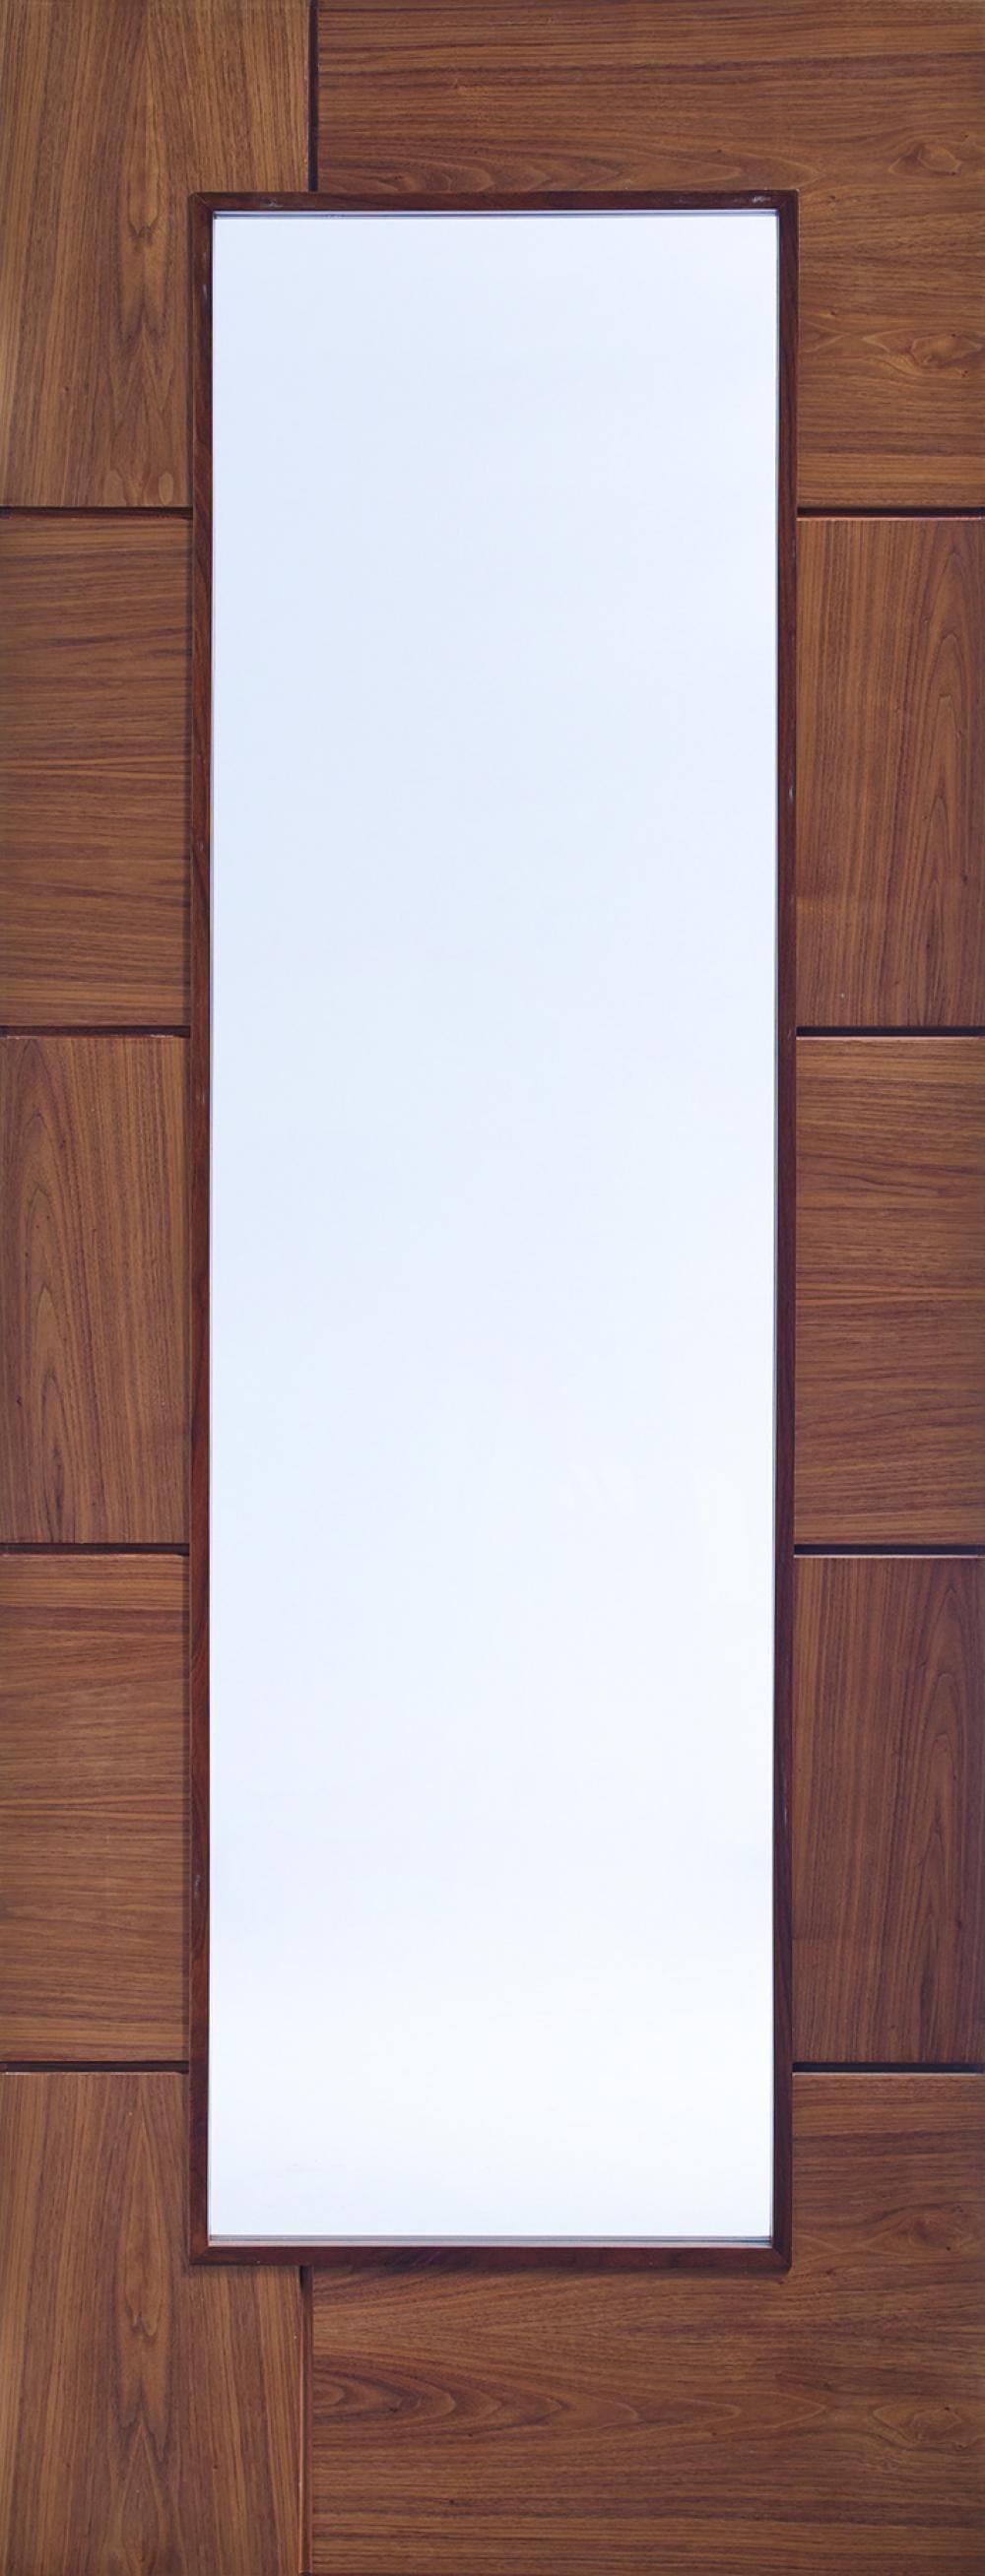 Ravenna Walnut - Prefinished Clear Glass Image